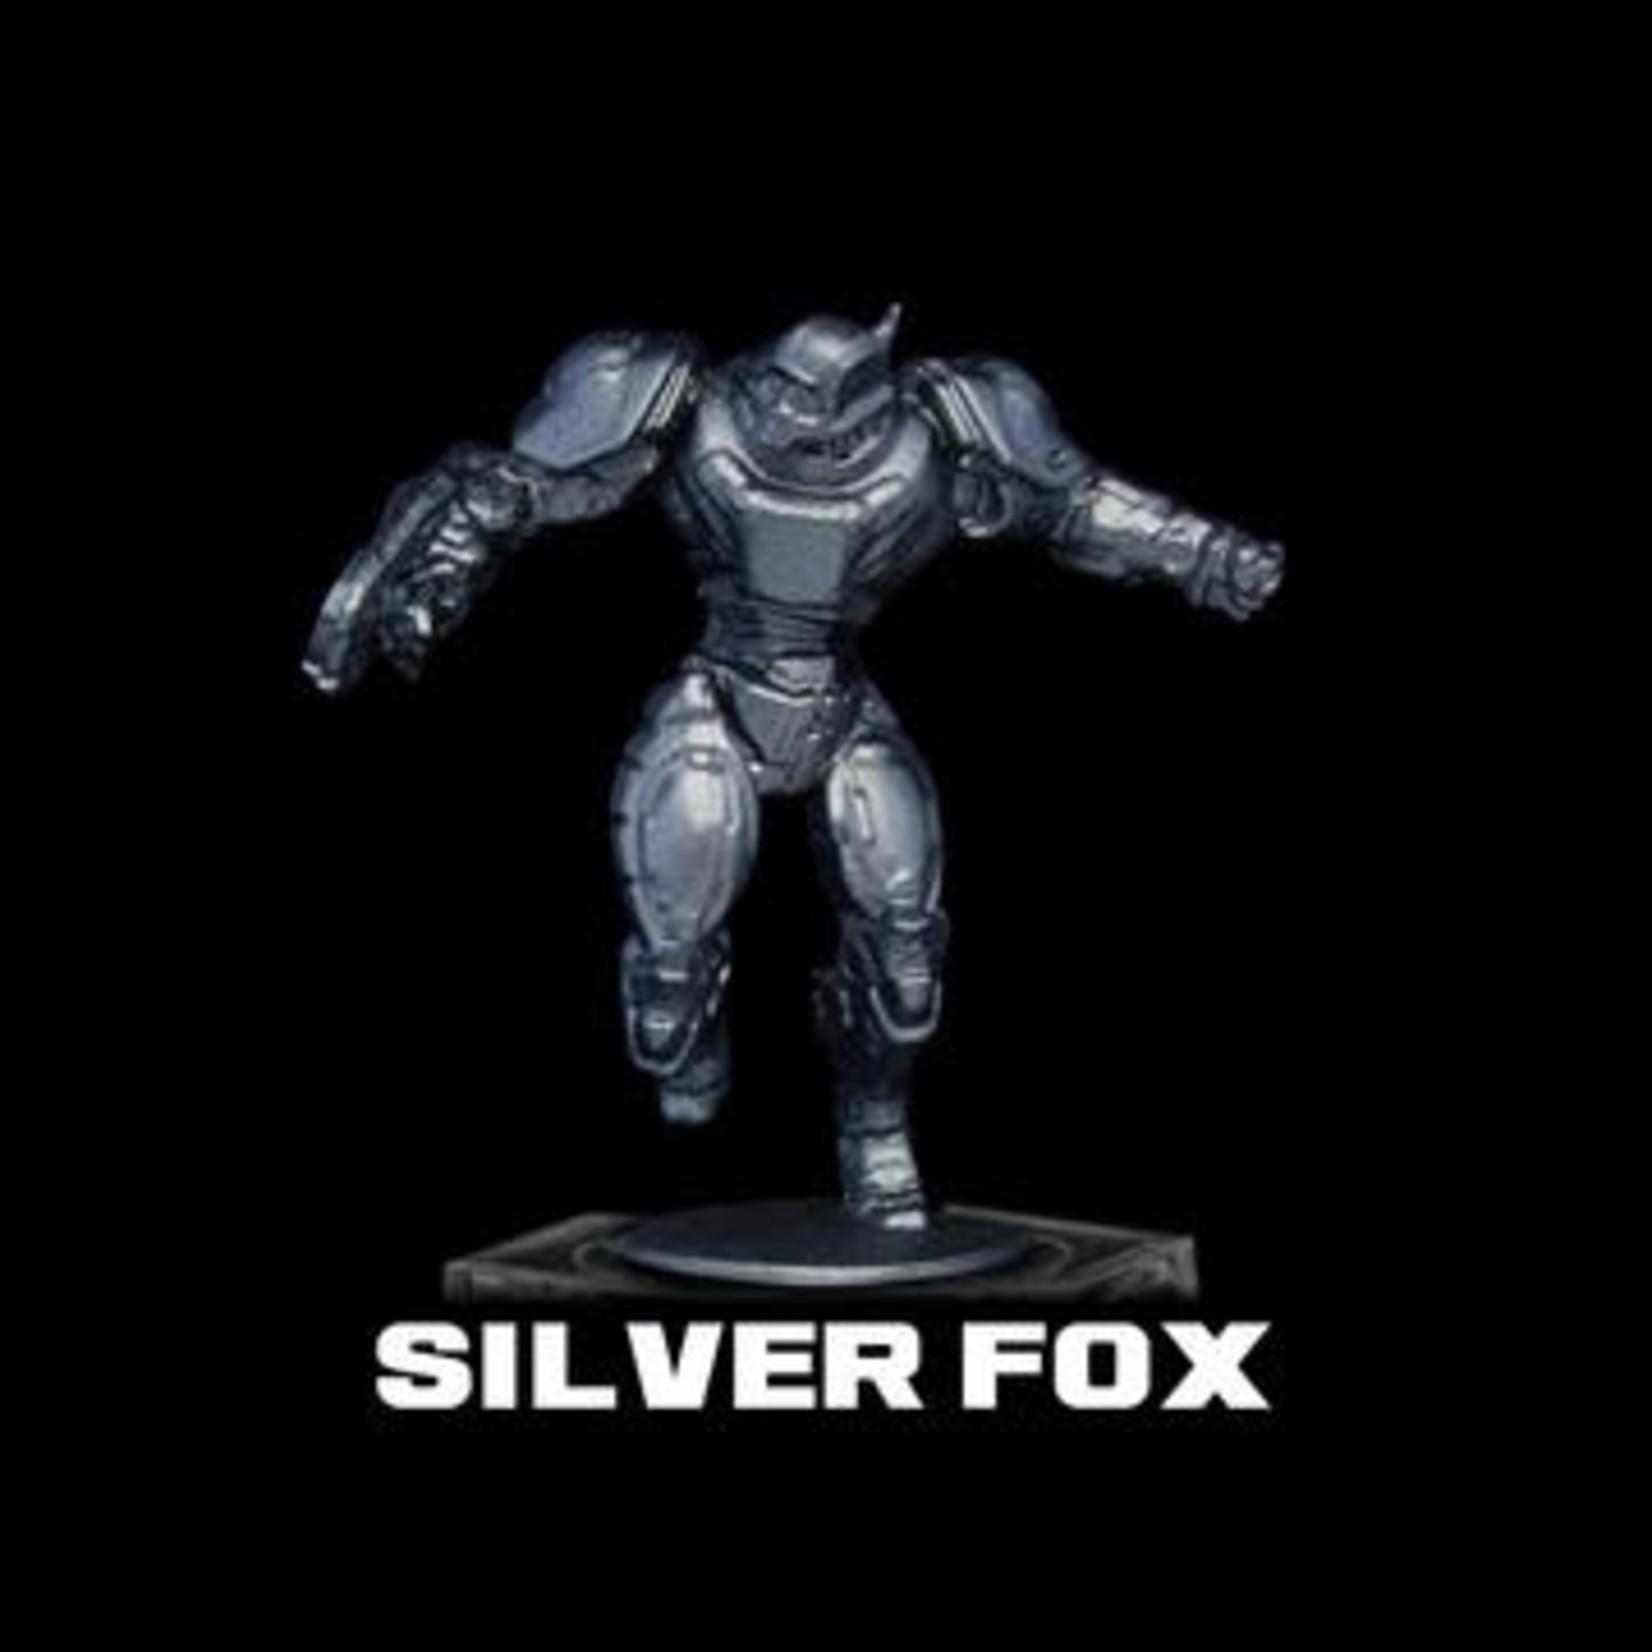 Turbo Dork Silver Fox (Metallic)